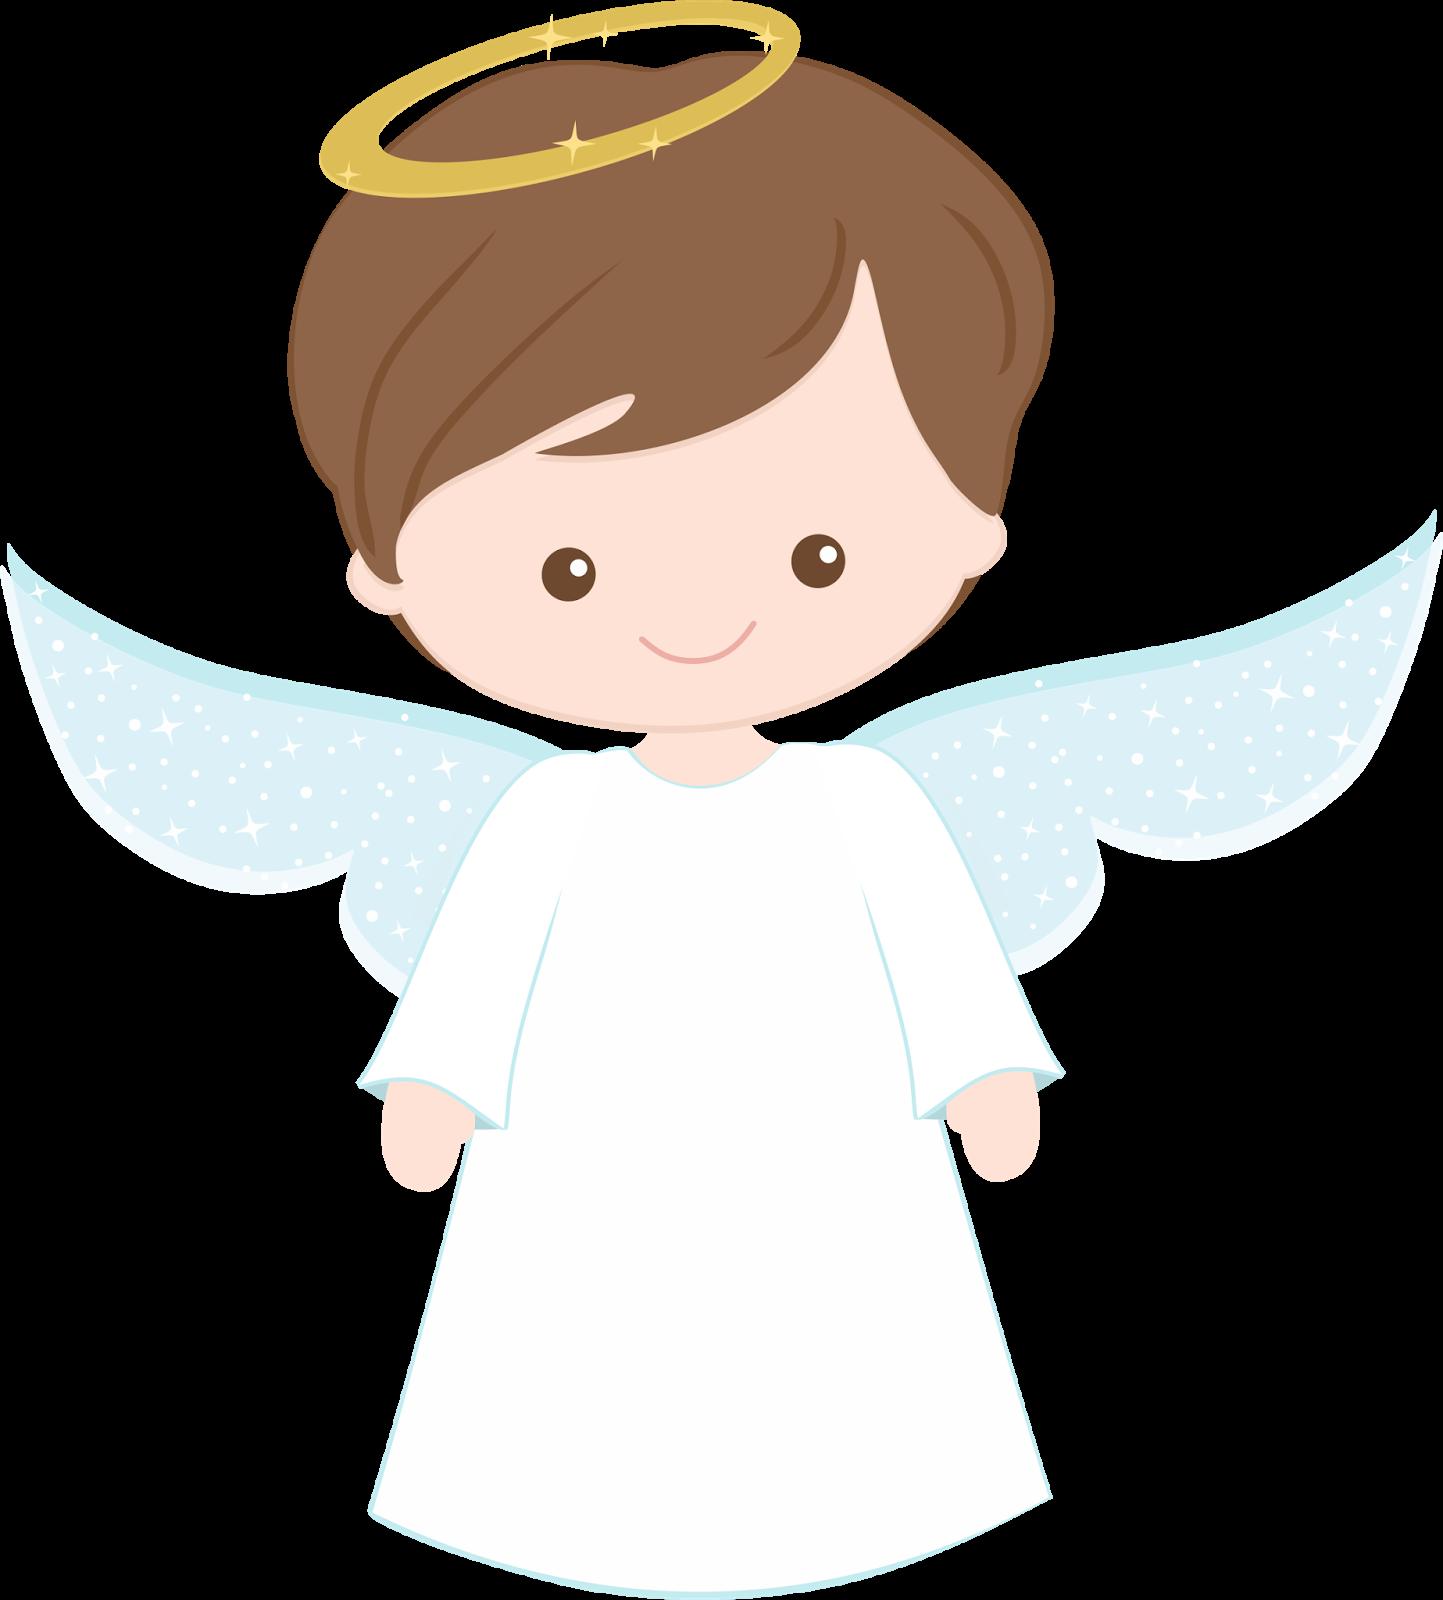 Imxheuyui upb png bautizo. Heaven clipart angel